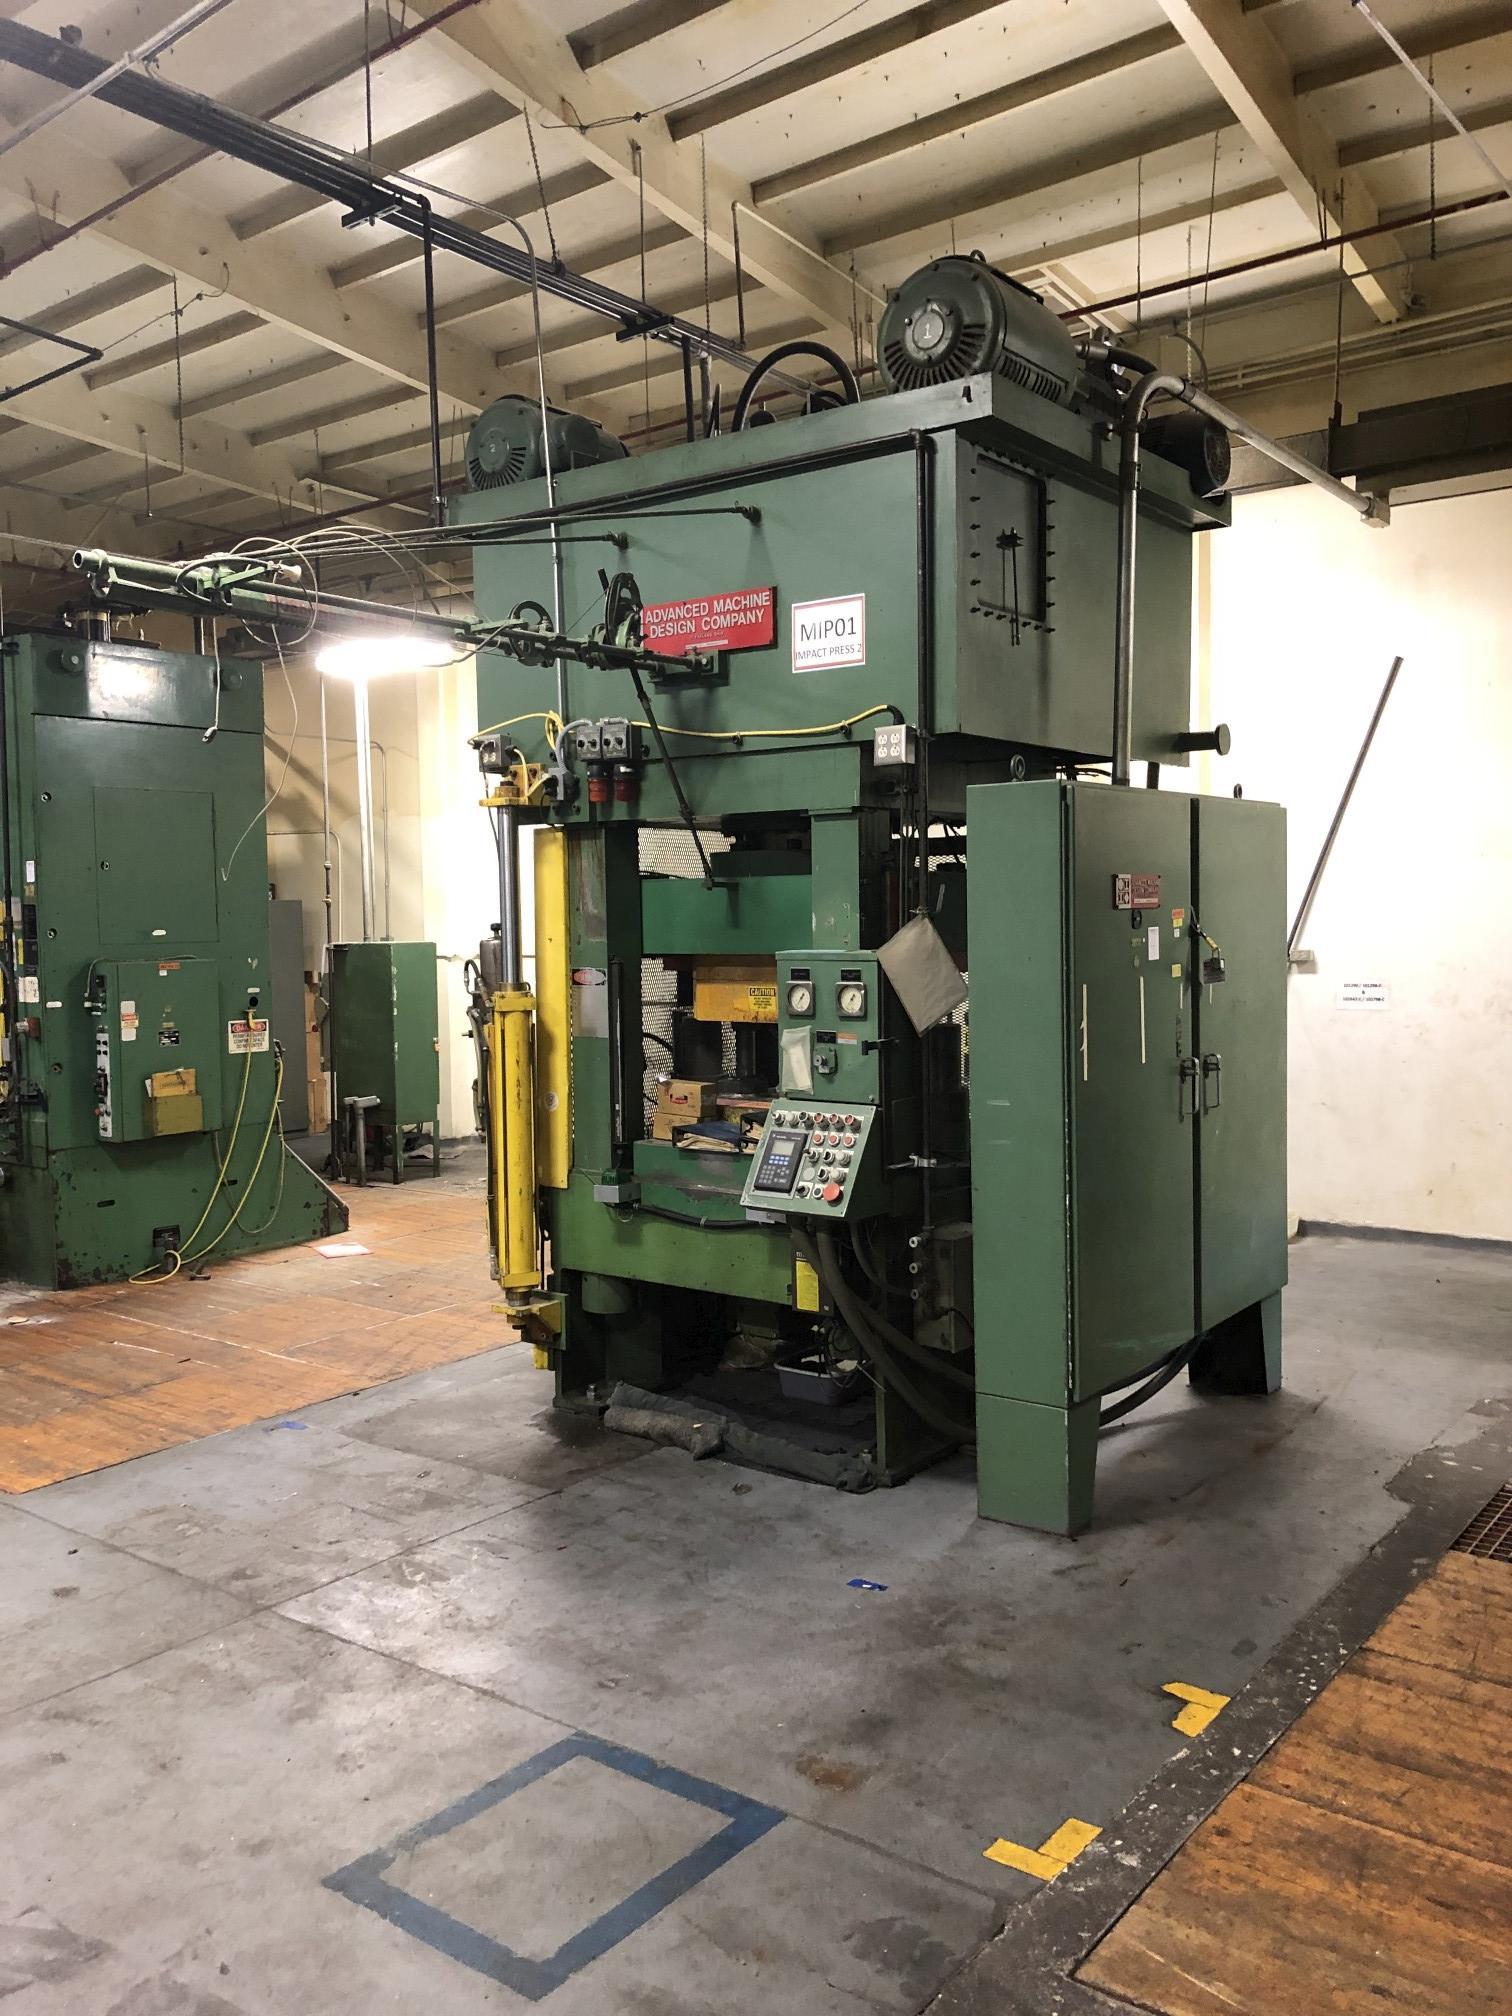 570 Ton Advanced Machine Design Straight Side Press - Image 3 of 15